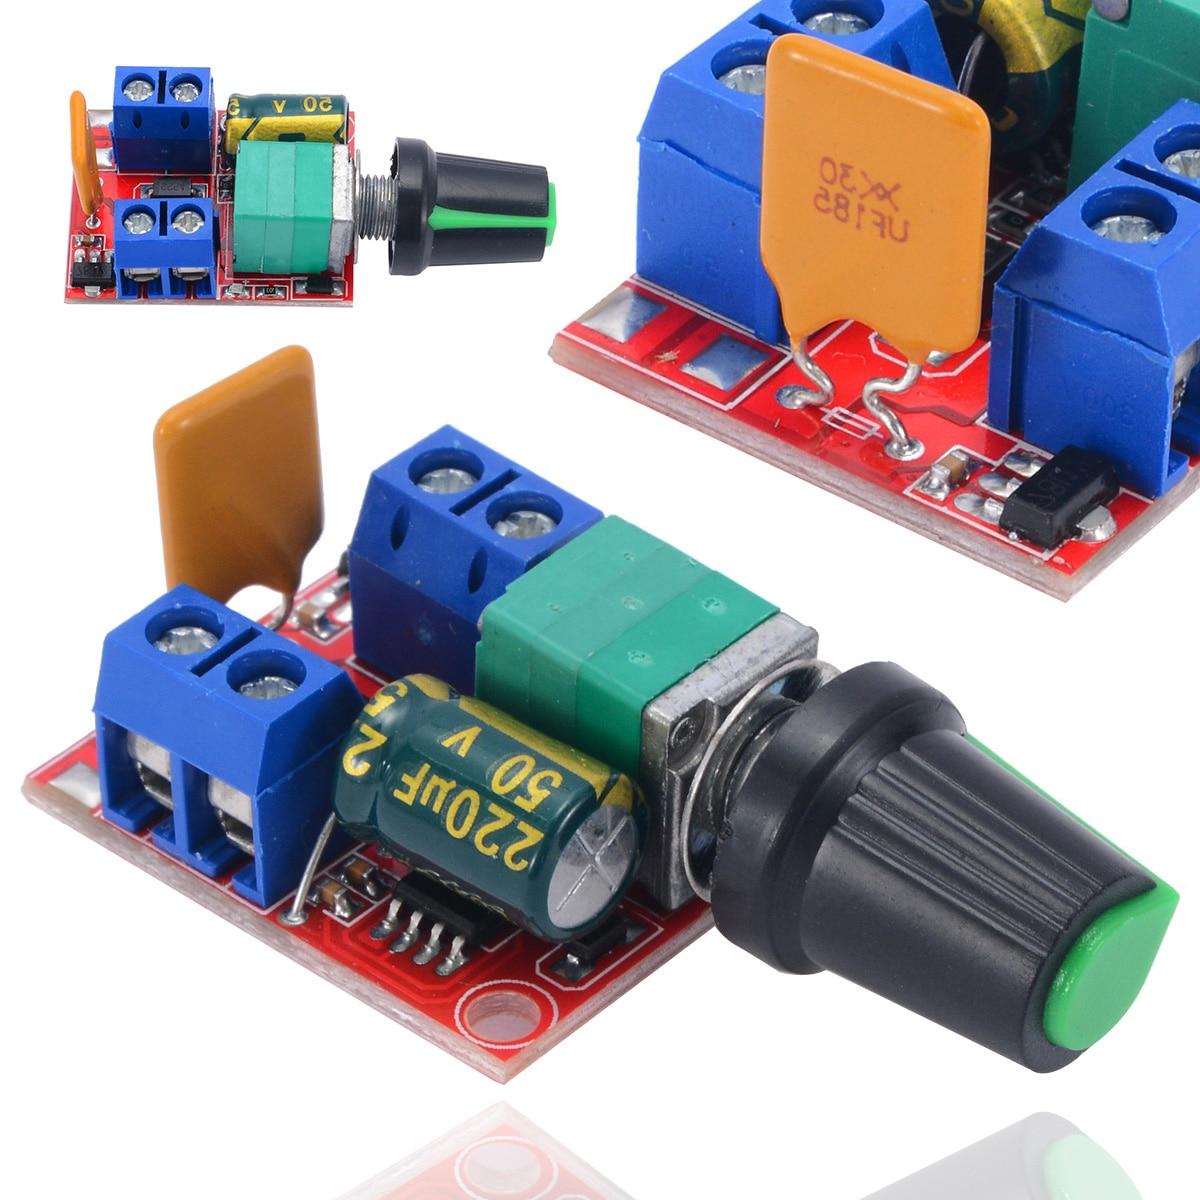 H4BBT-10104-A1 JUMPER-H9992TR//A3047A//H9992TR 4 Pack of 100